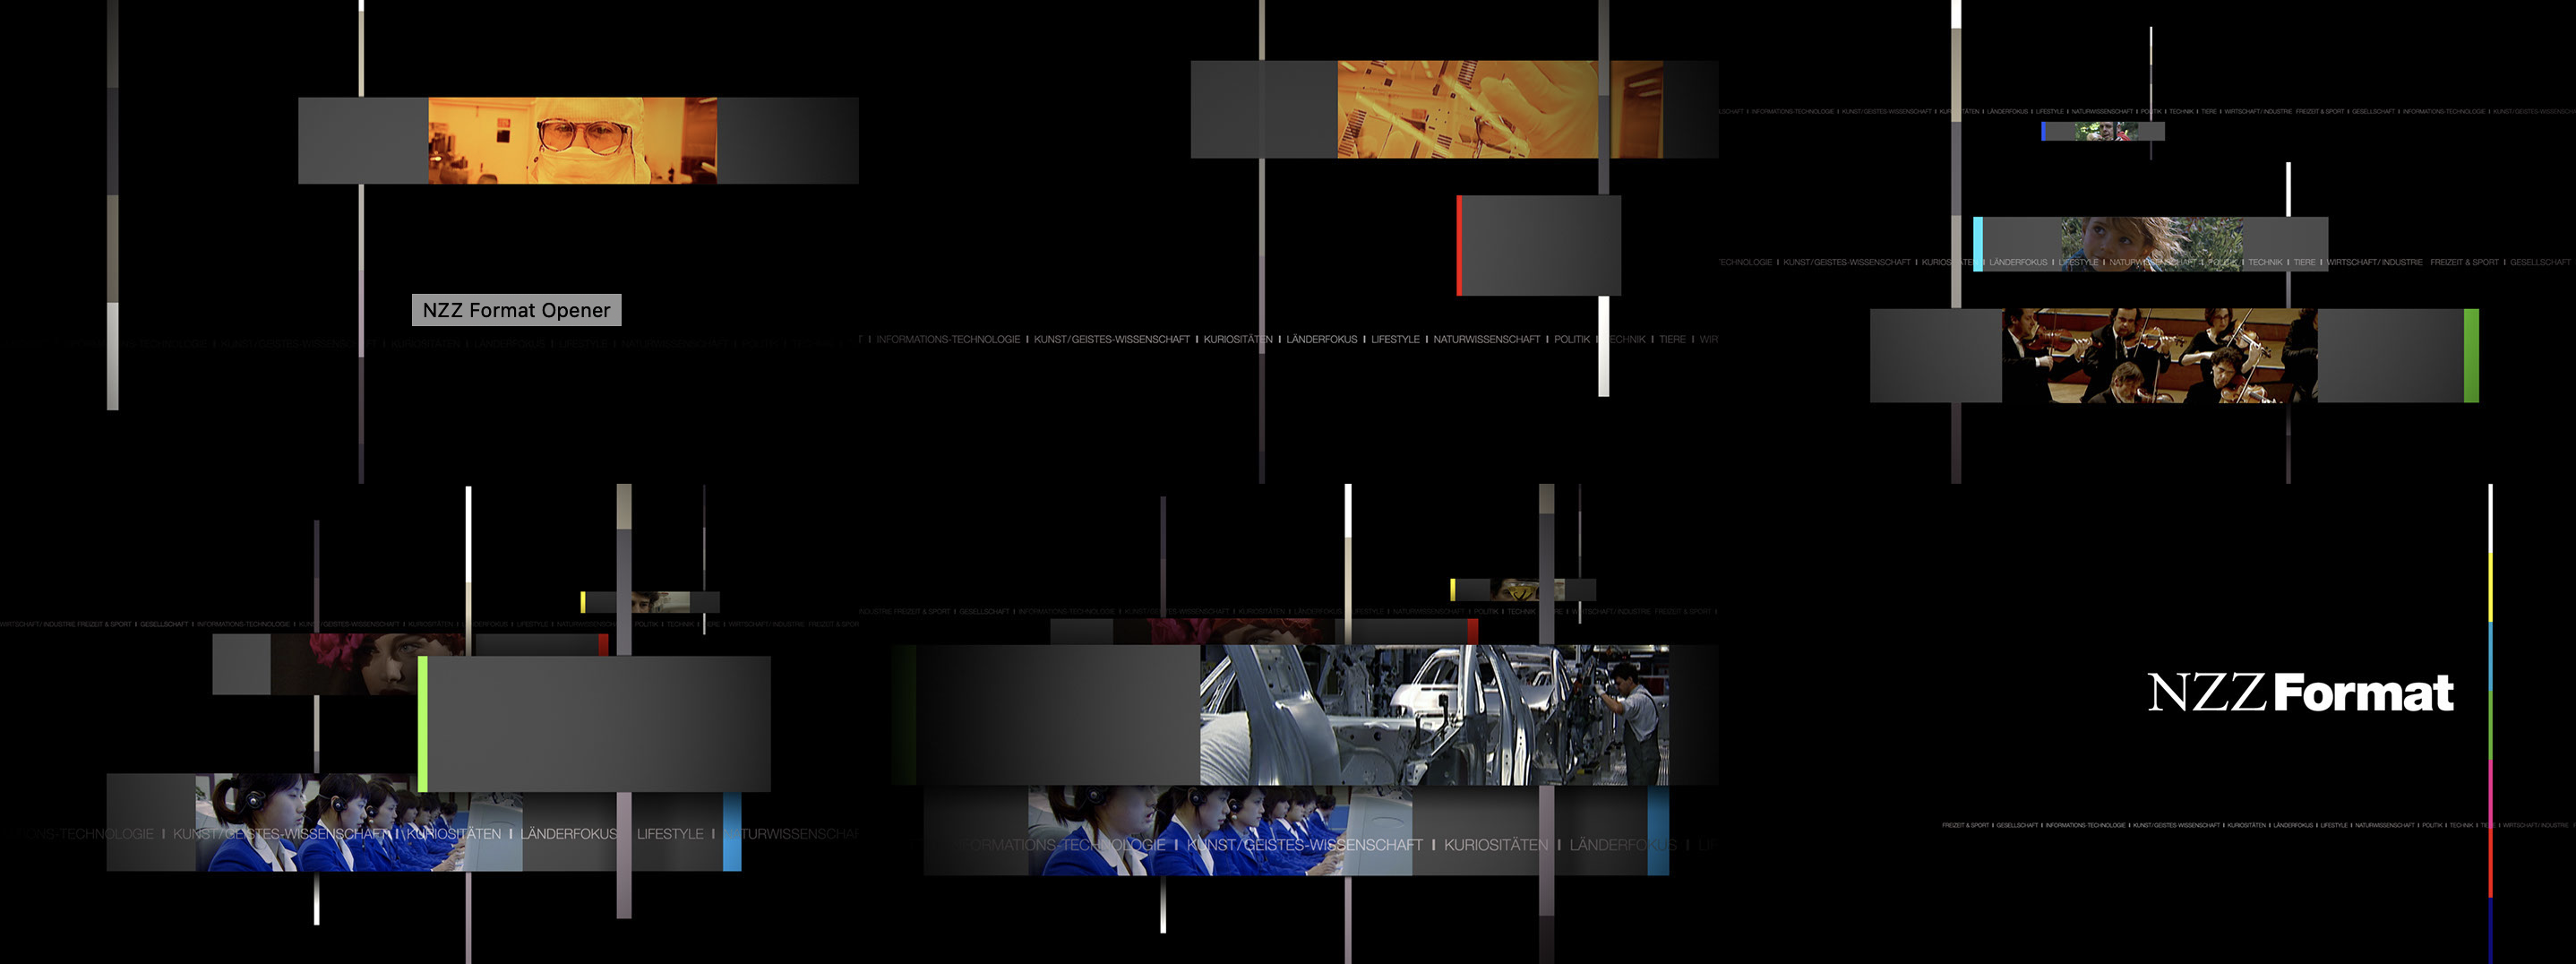 NZZ Format, NZZ Swiss Made, On Air Design, Creative Concept, Film Editing, Motion Design, Motion Graphics, Michael Frei, Zurich, Switzerland.